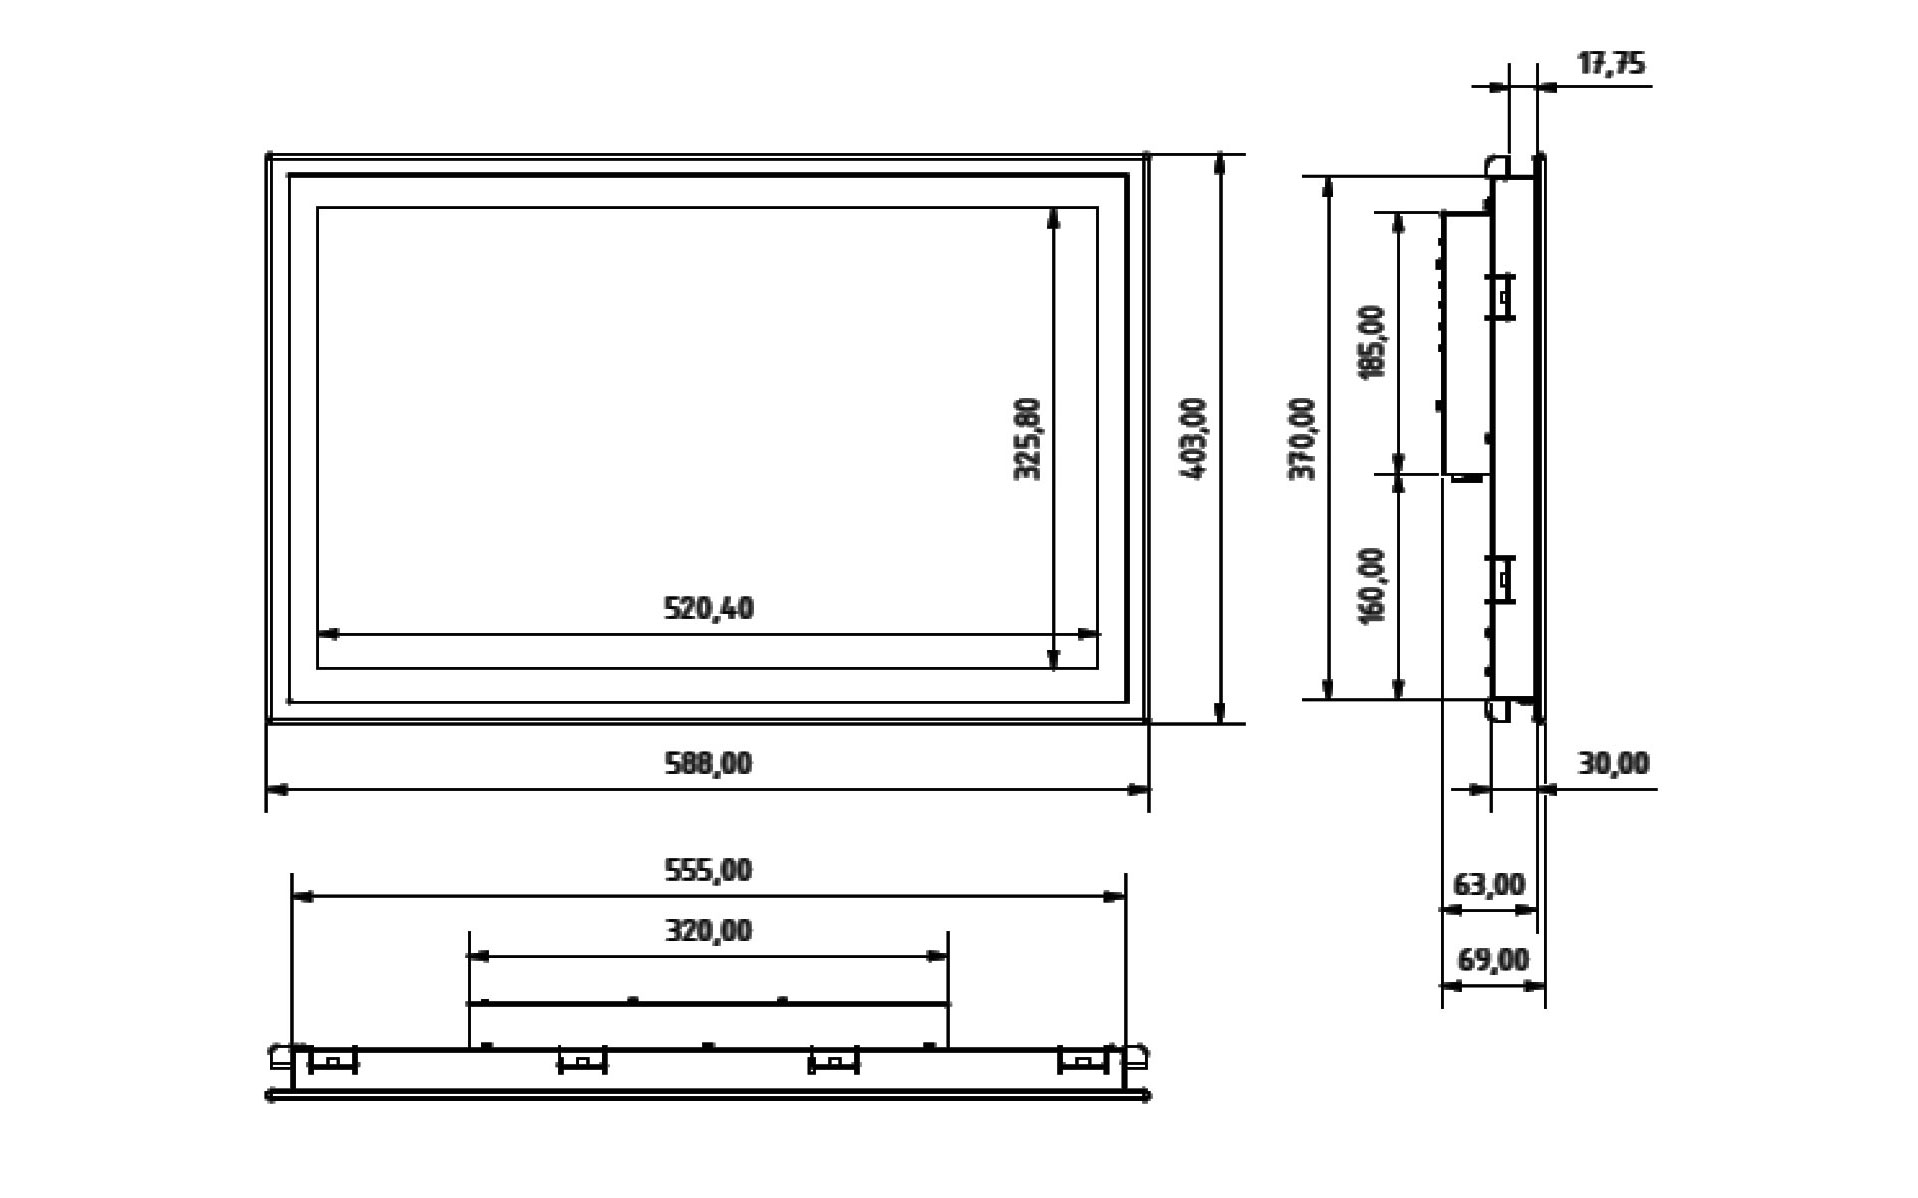 SCM-240 Einbau-Industrie-Monitor mit Touchscreen (Skizze)